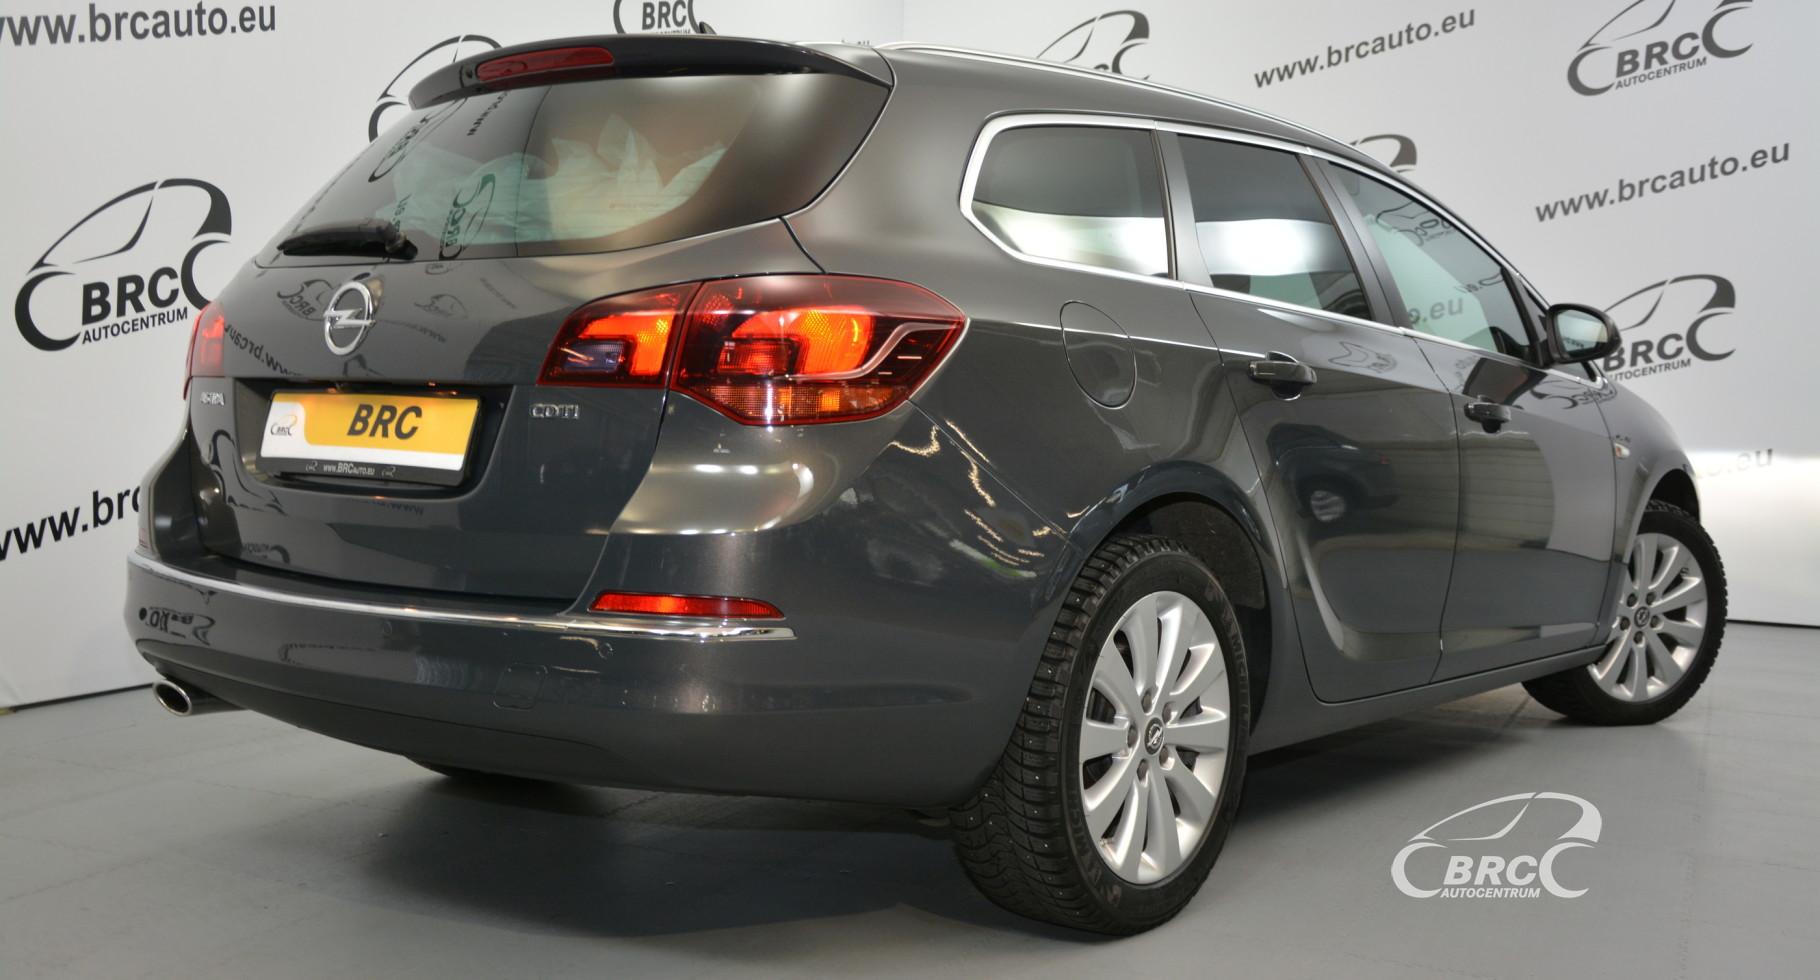 Opel Astra 2.0 CDTi Caravan